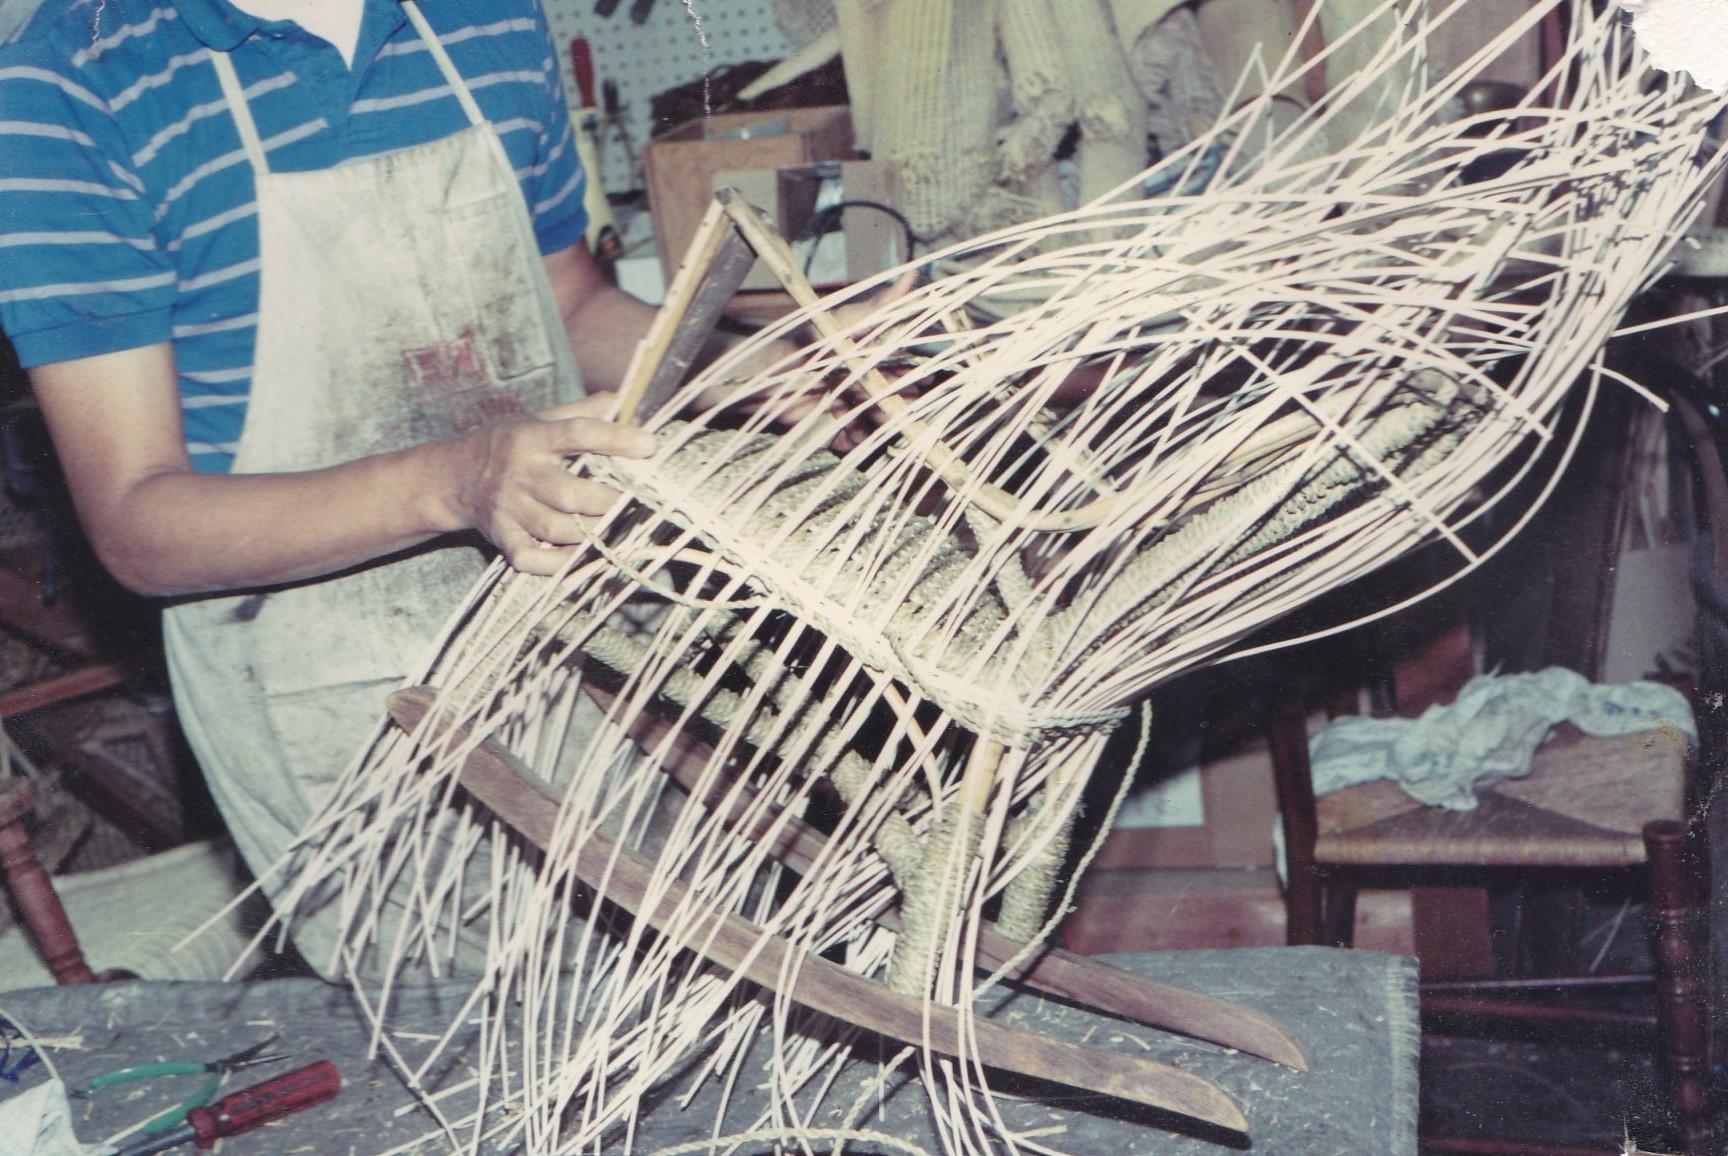 Lazo's Caning & Wicker image 2